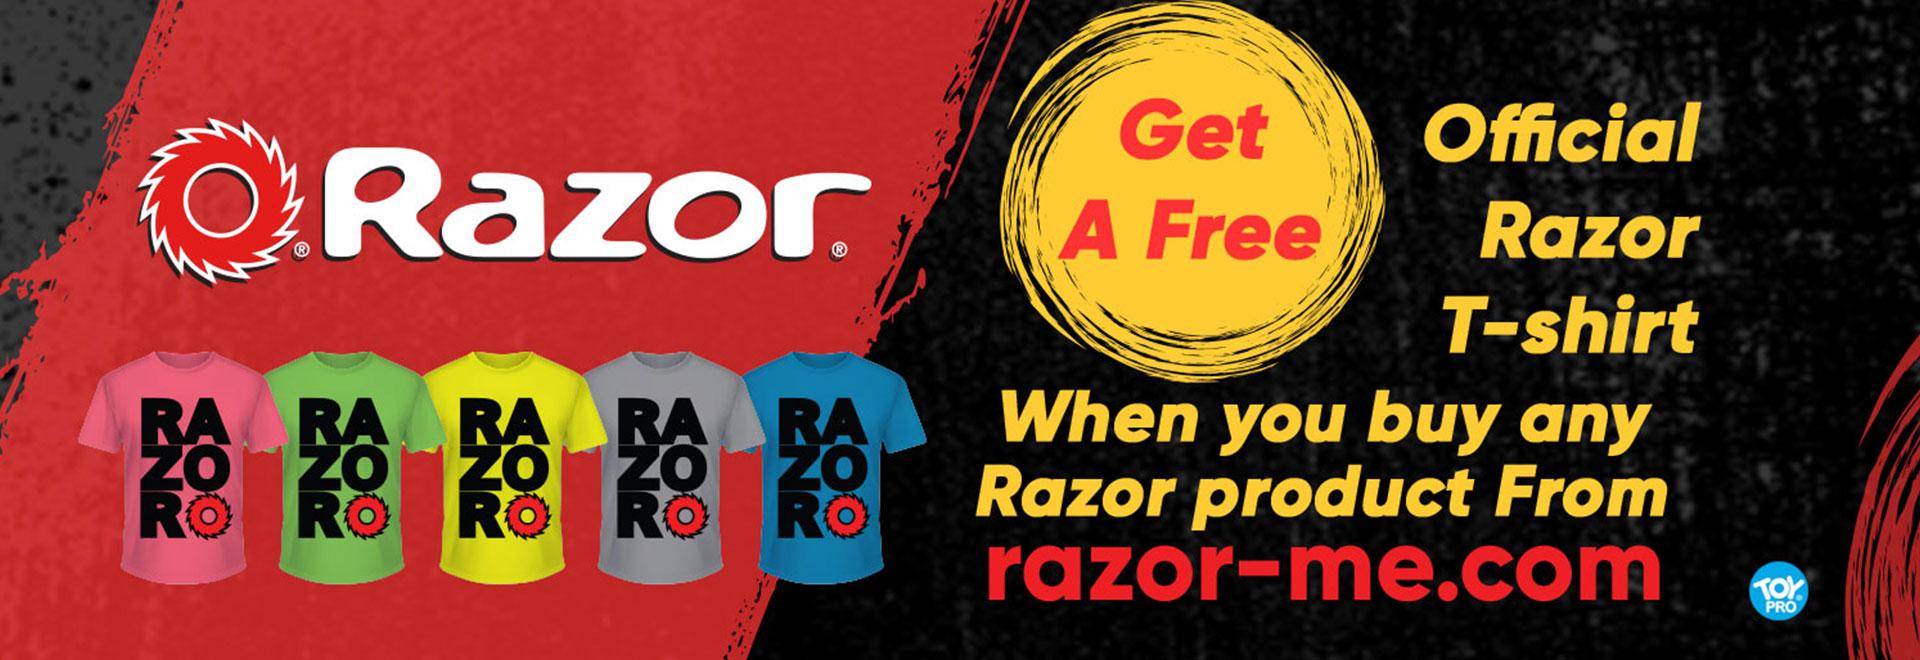 razor official t shirt